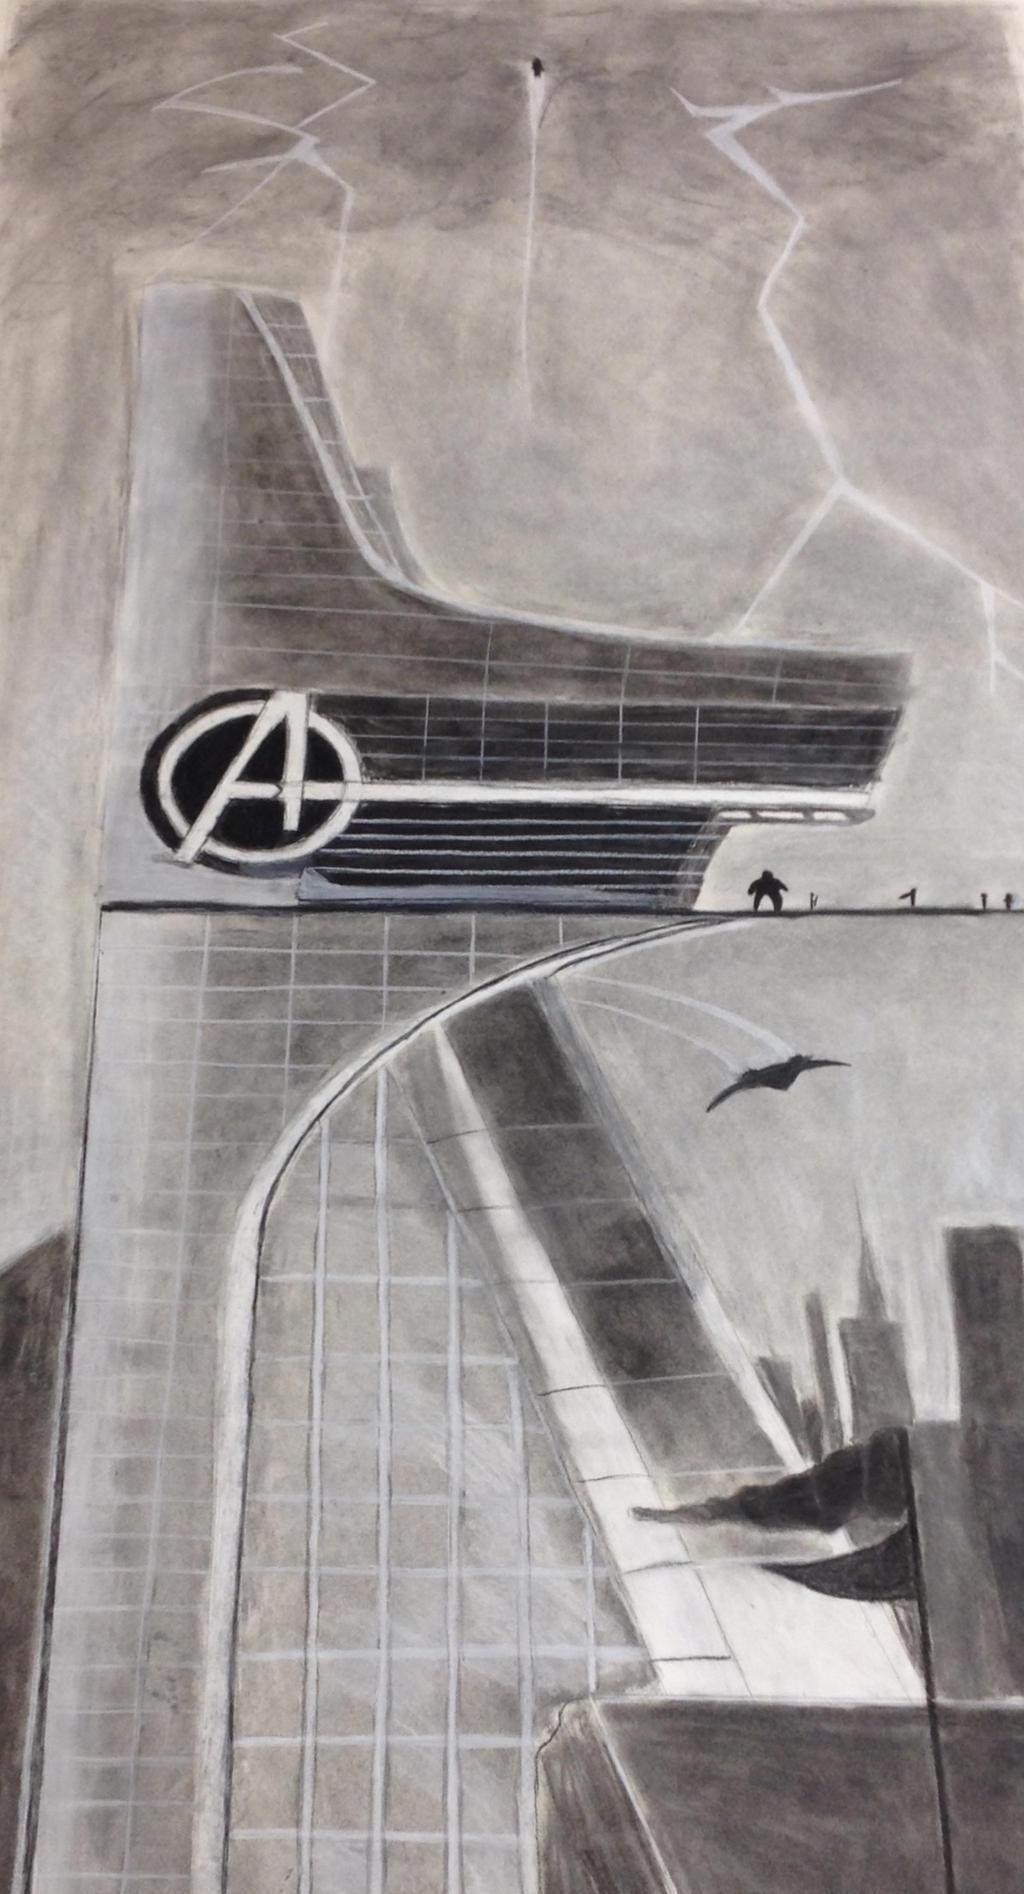 Avengers Tower By DarkMatterNat On DeviantArt